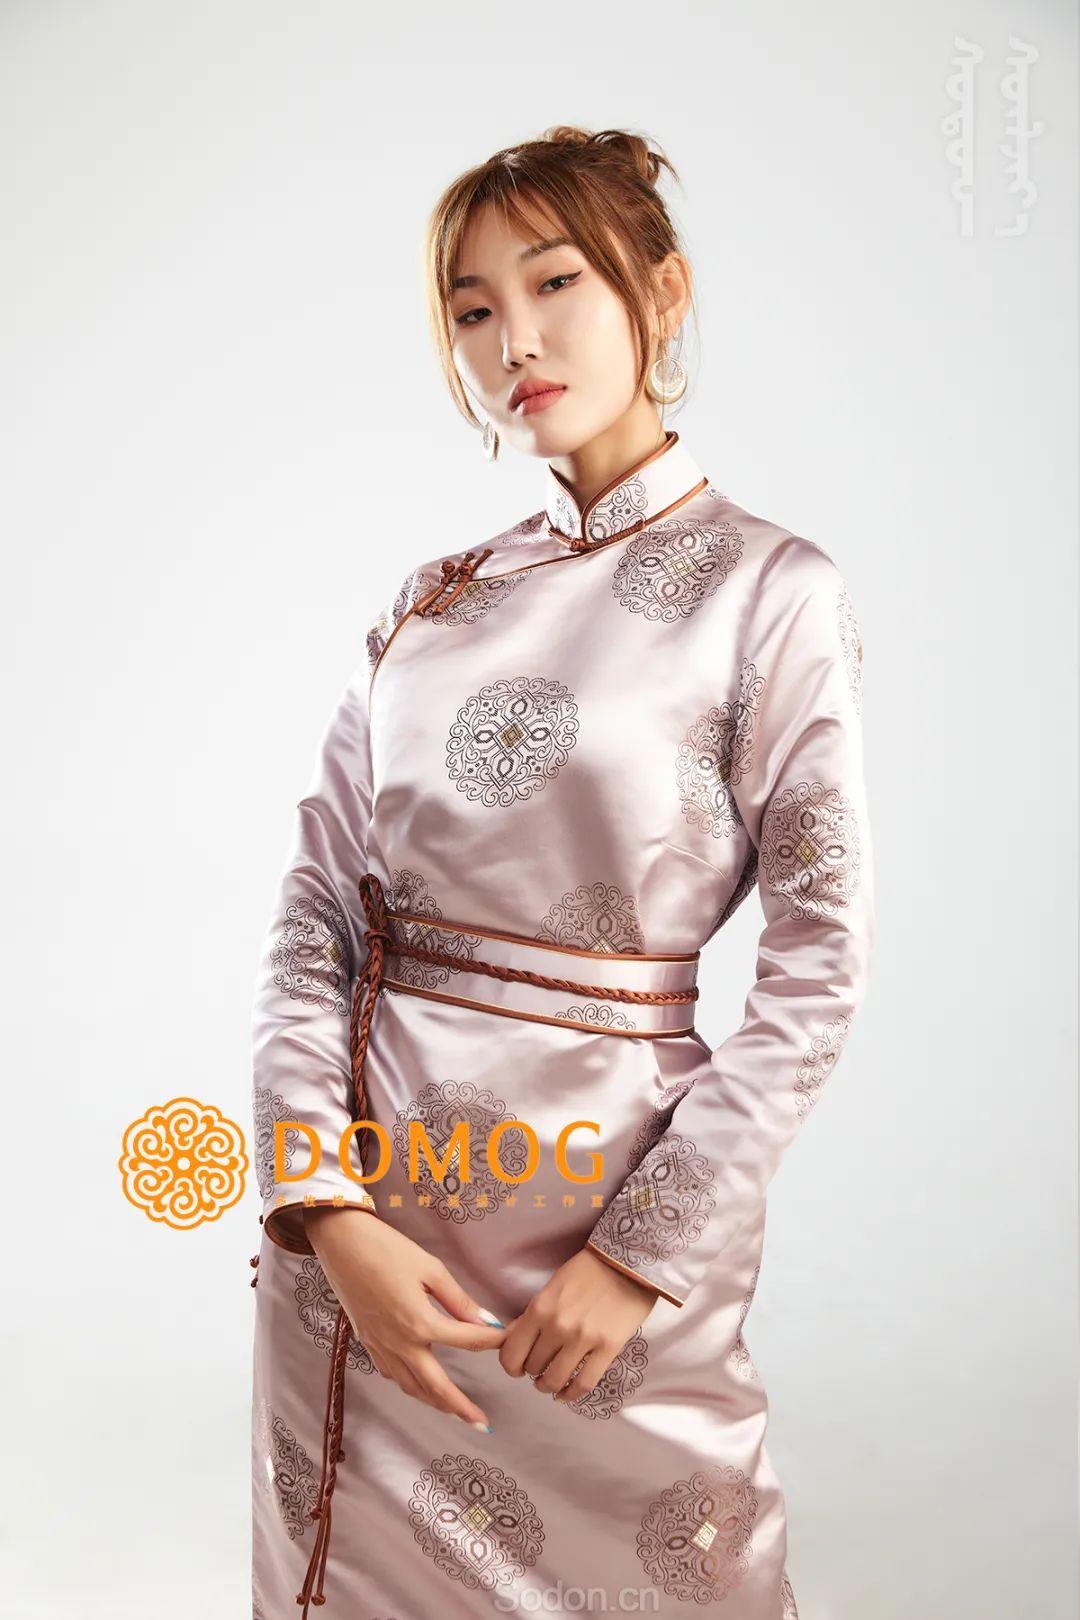 DOMOG 蒙古时装2020新款,民族与时尚的融合 第7张 DOMOG 蒙古时装2020新款,民族与时尚的融合 蒙古服饰